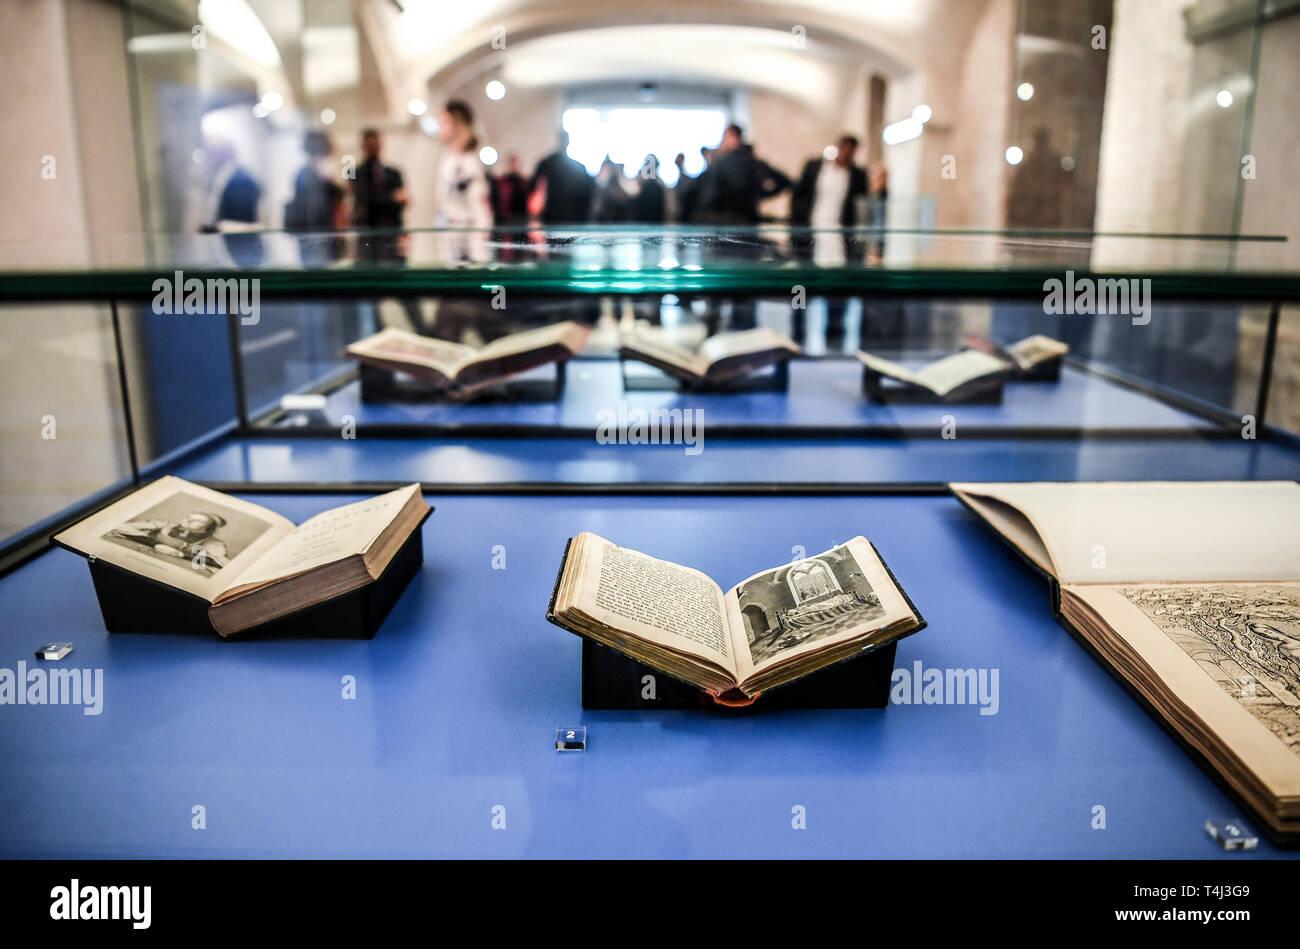 Ancient Egypt Literature Stock Photos & Ancient Egypt Literature